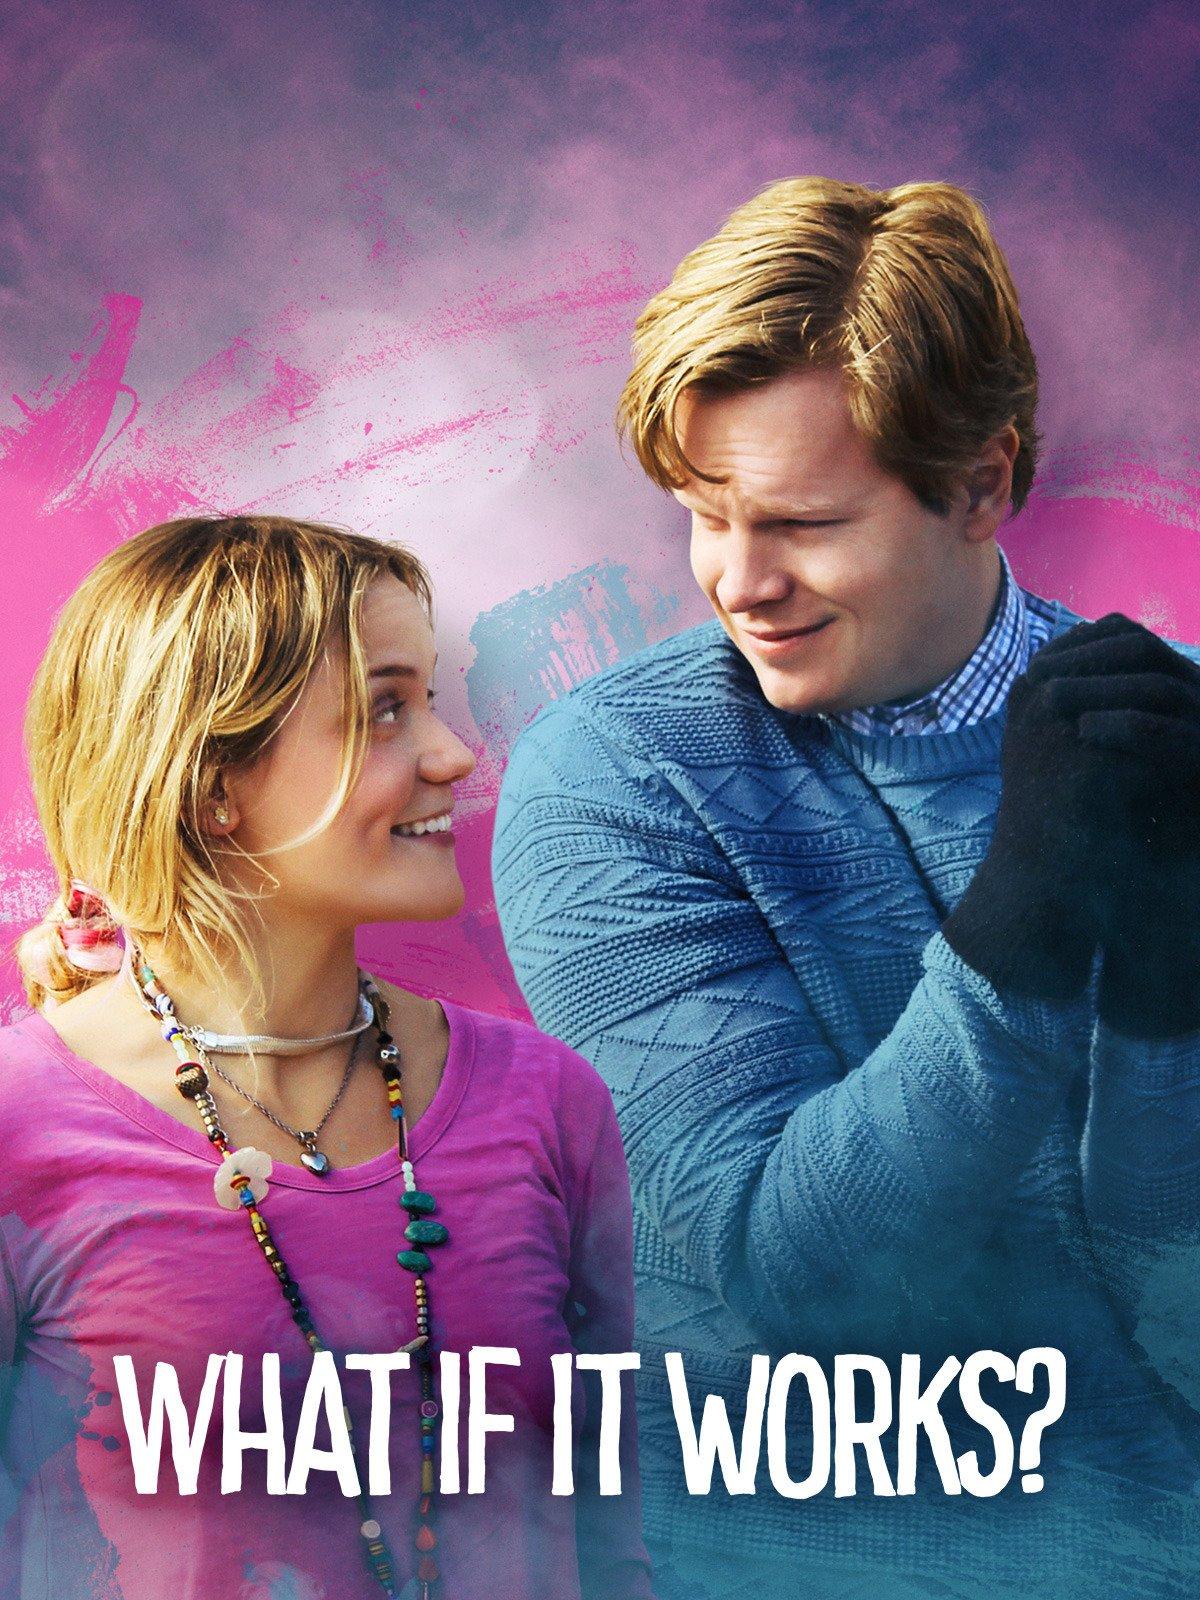 Amazon.com: What If It Works?: Luke Ford, Anna Samson, Brook ...